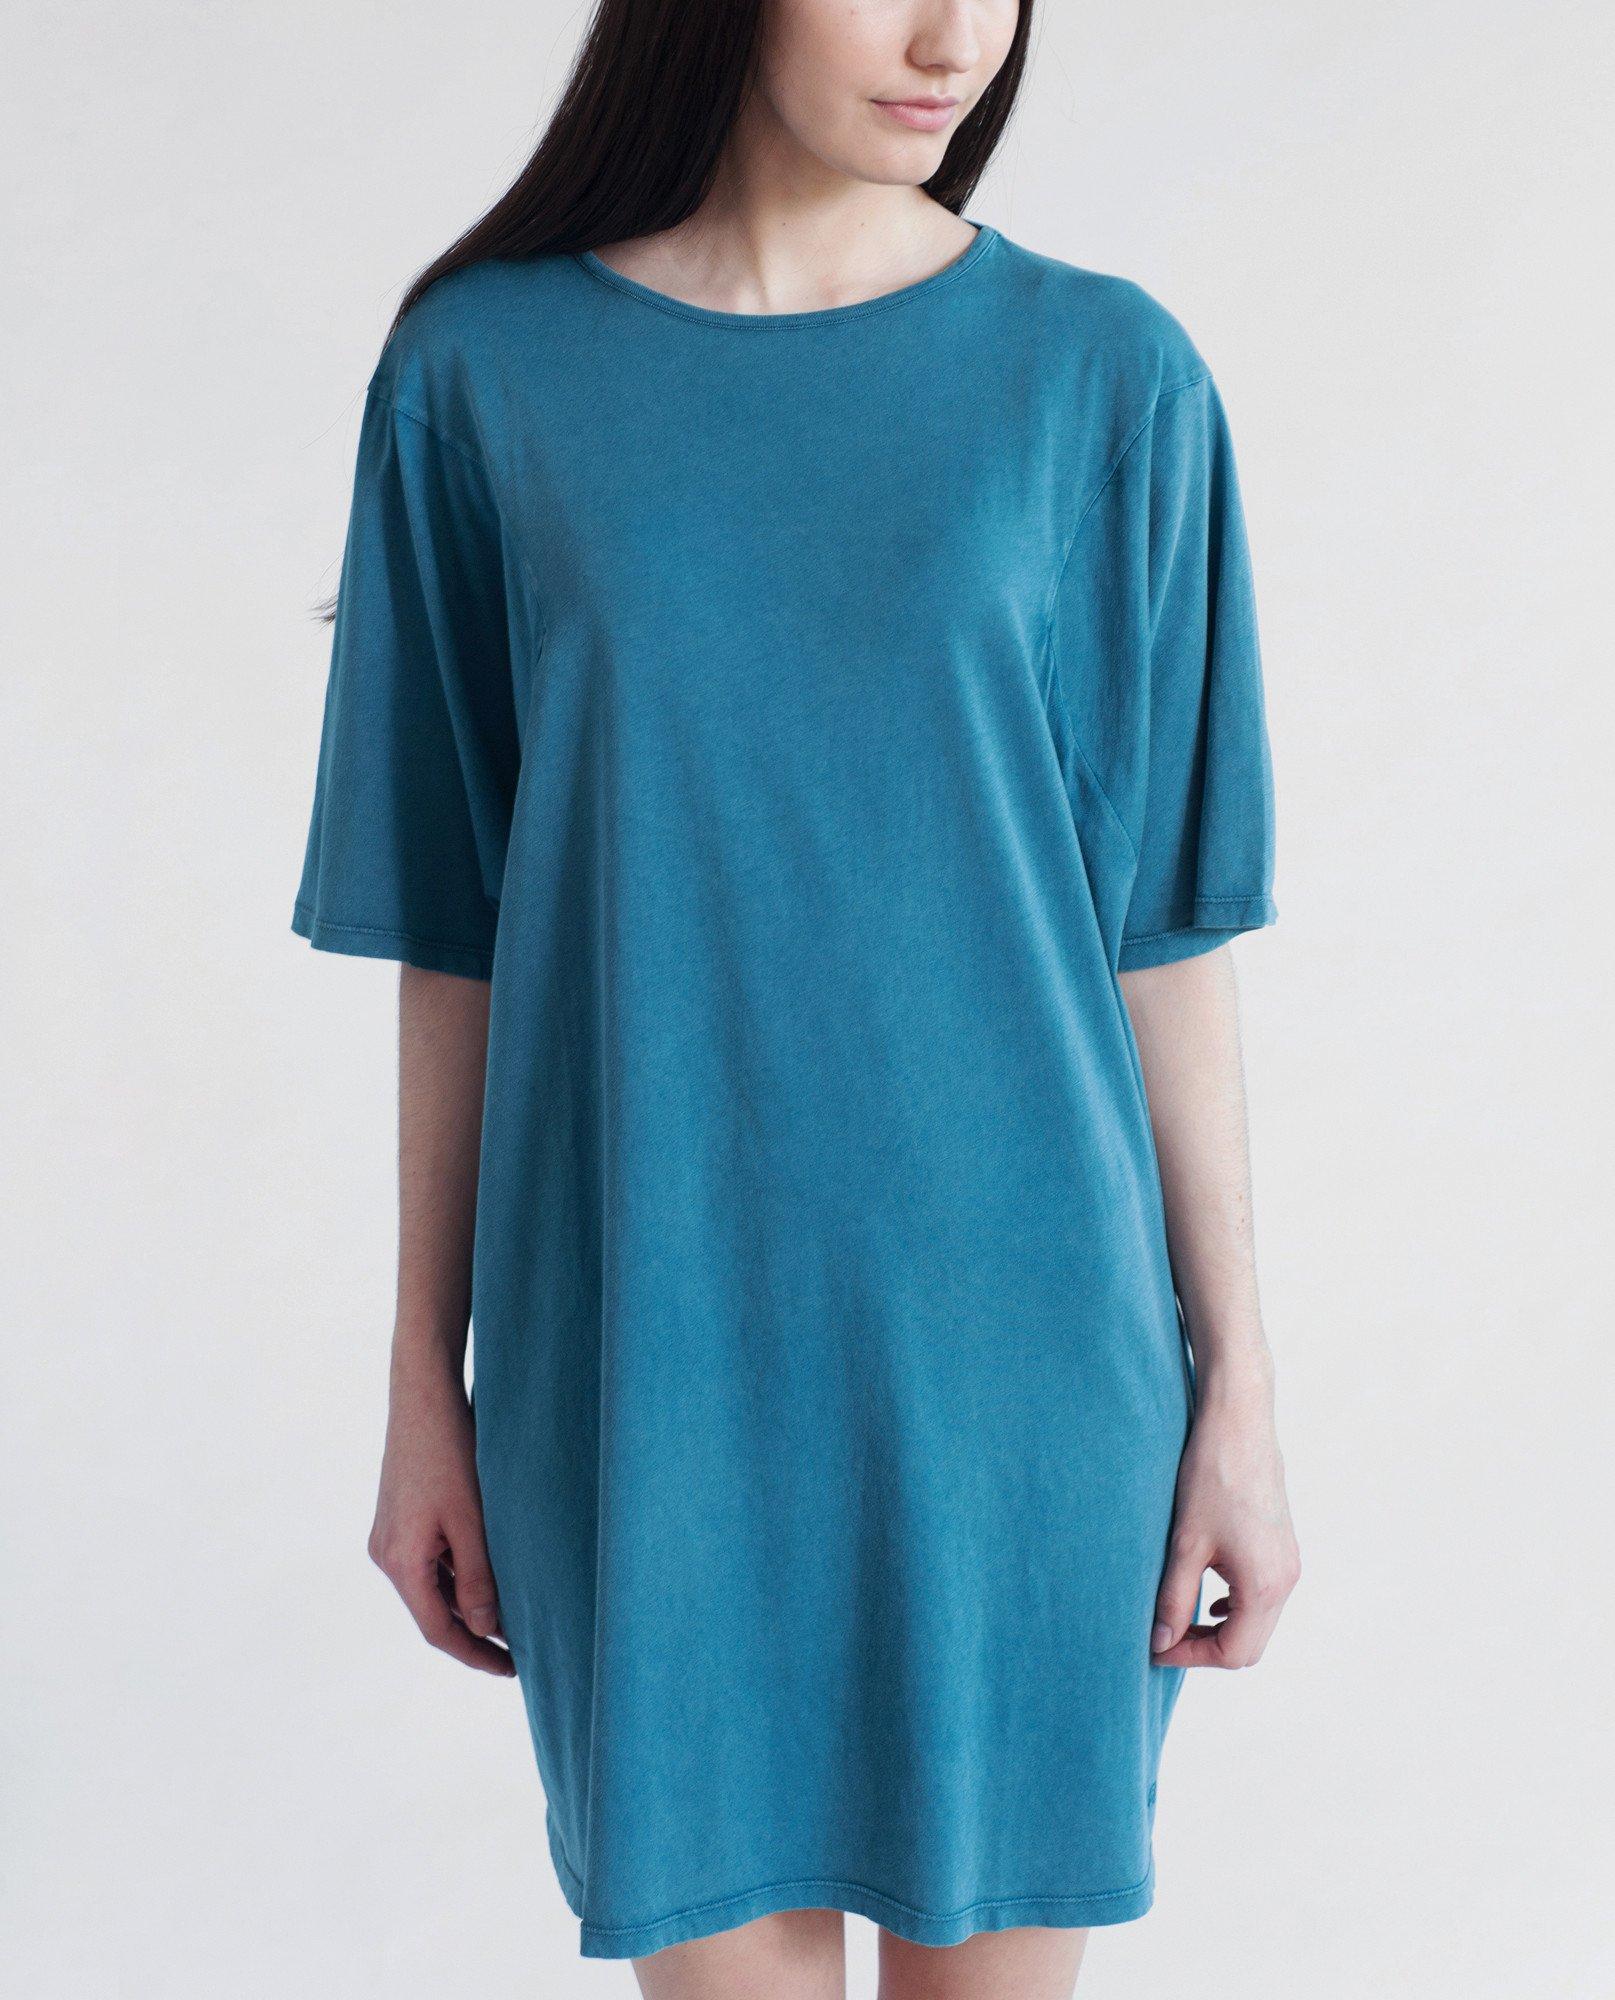 DAISY Organic Cotton Tshirt In Denim Blue from Beaumont Organic